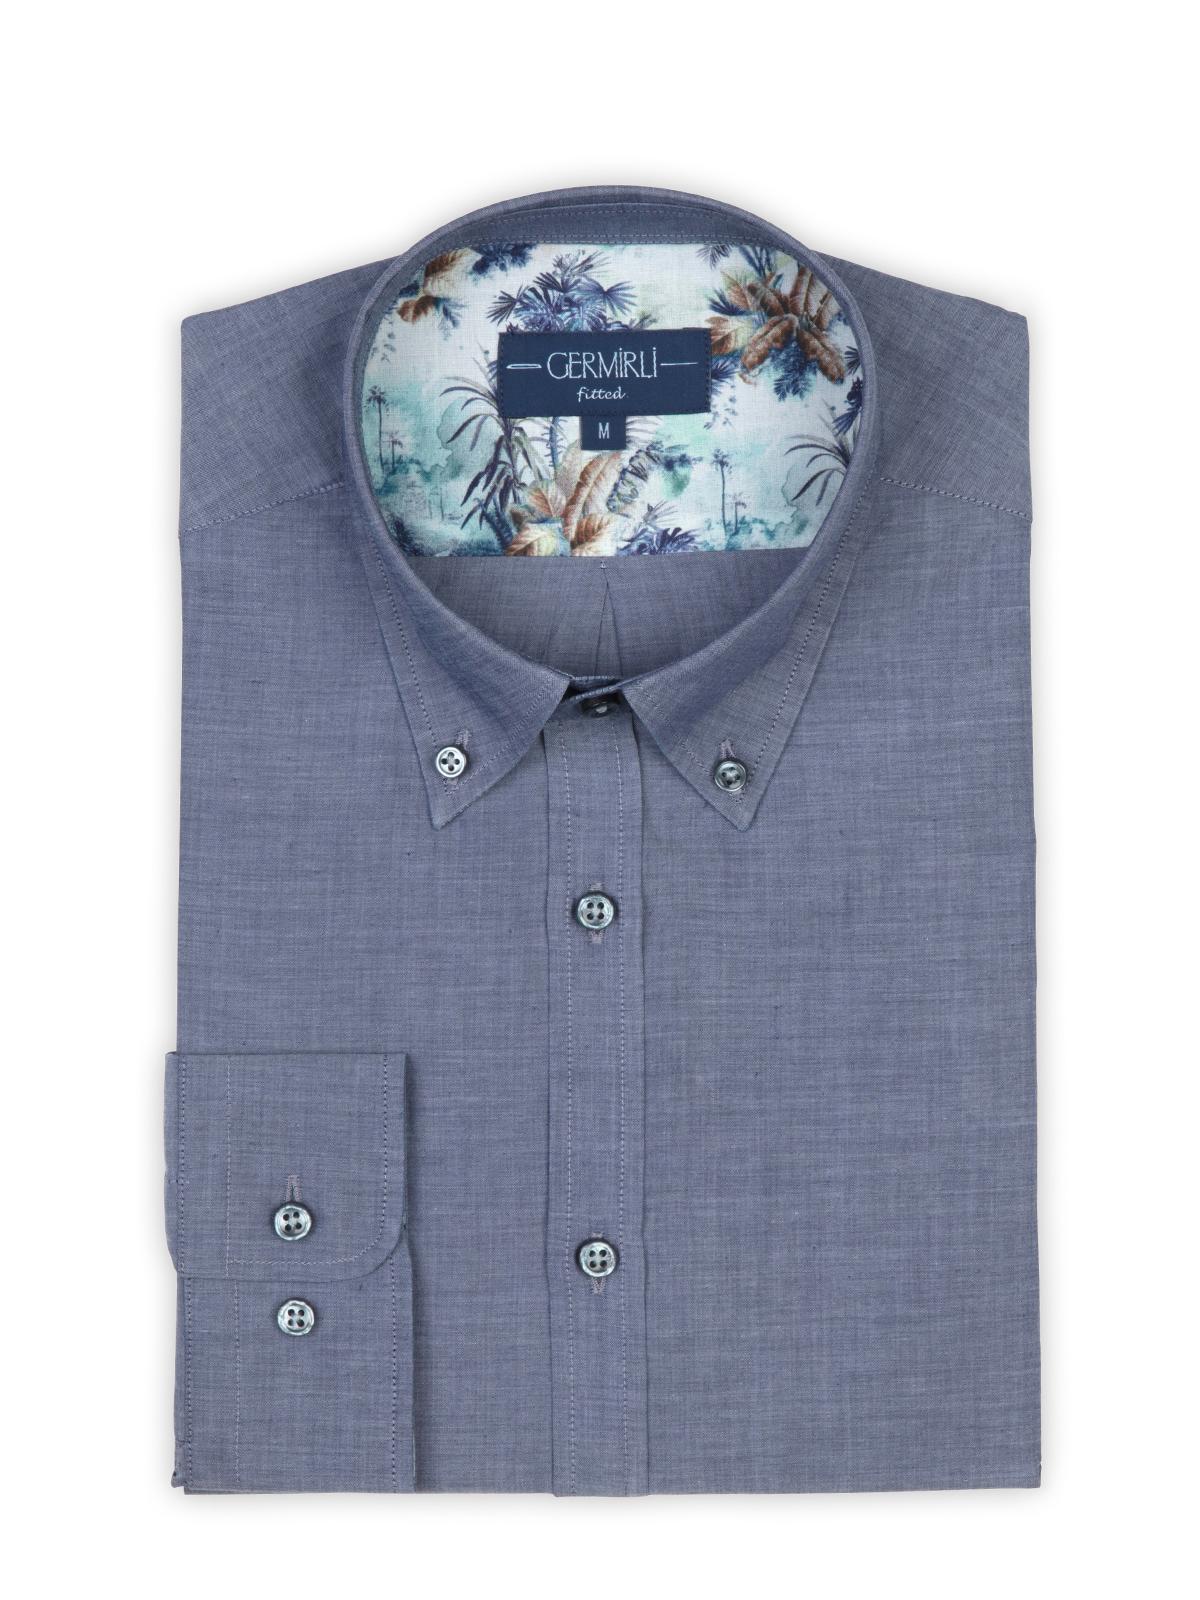 Germirli Blue Indigo Tropical design contrast Button Down Collar Tailor Fit Shirt